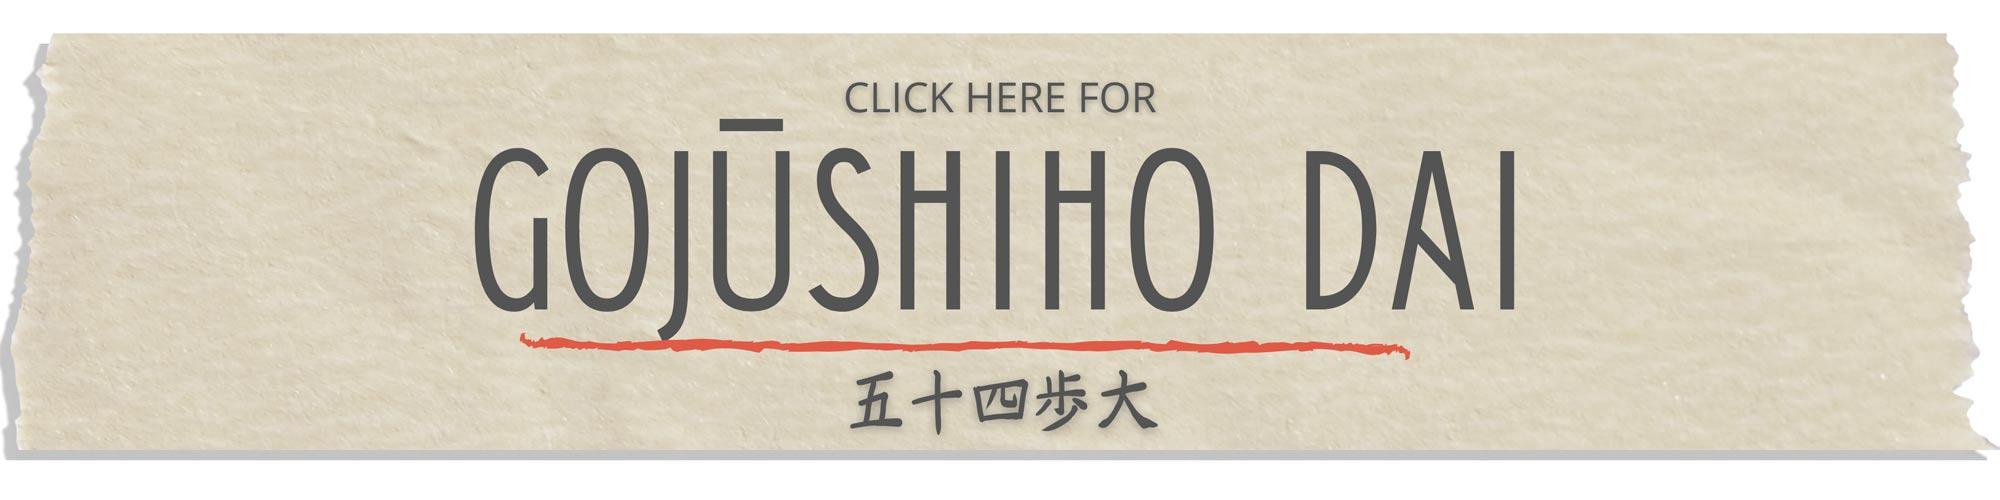 gojushiho dai tutorial